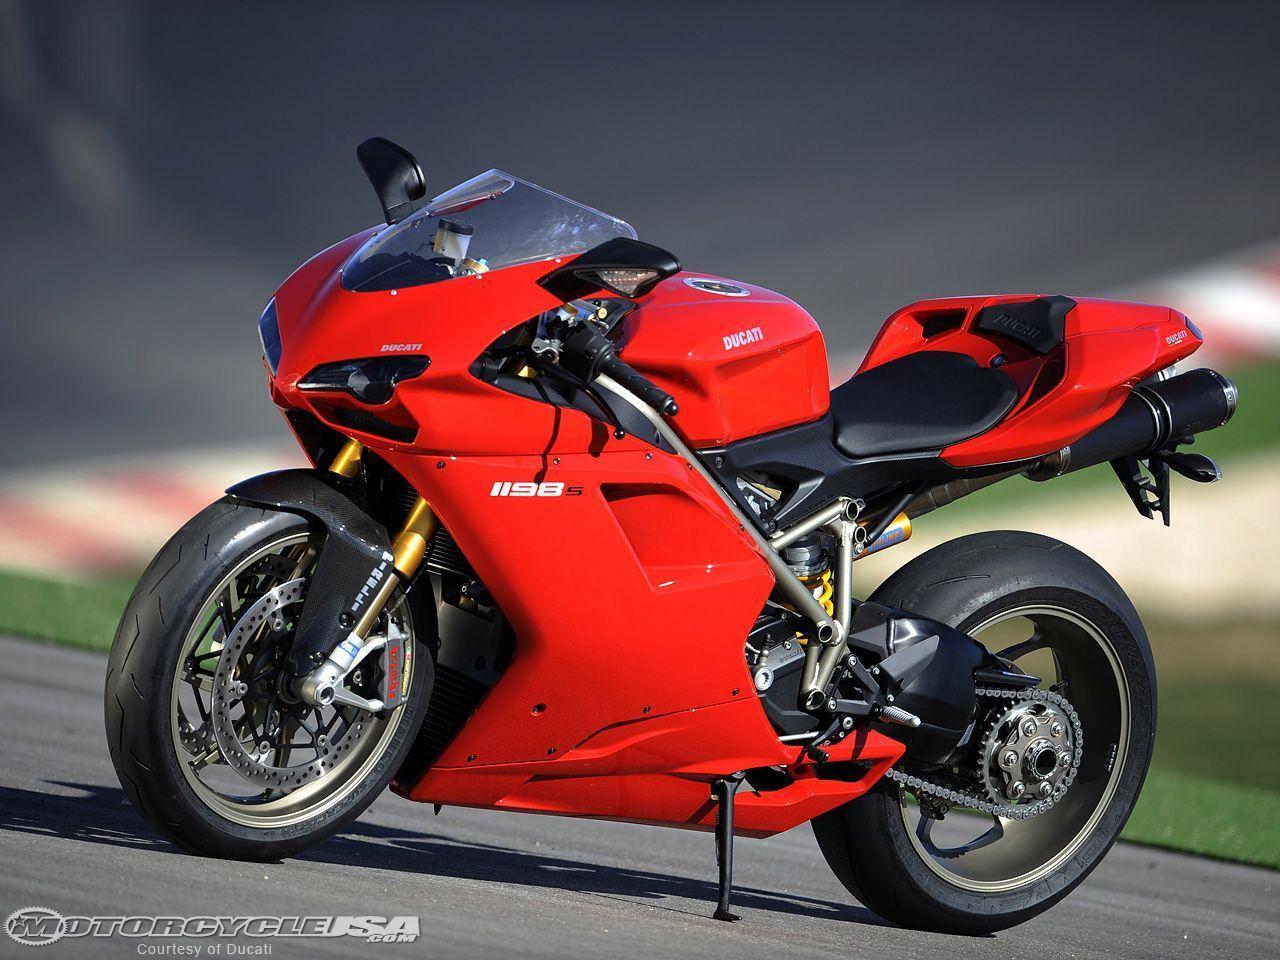 ducati 1198s motorcycle usa review rh unp me Ducati Superbikes Dukati Motorcycle